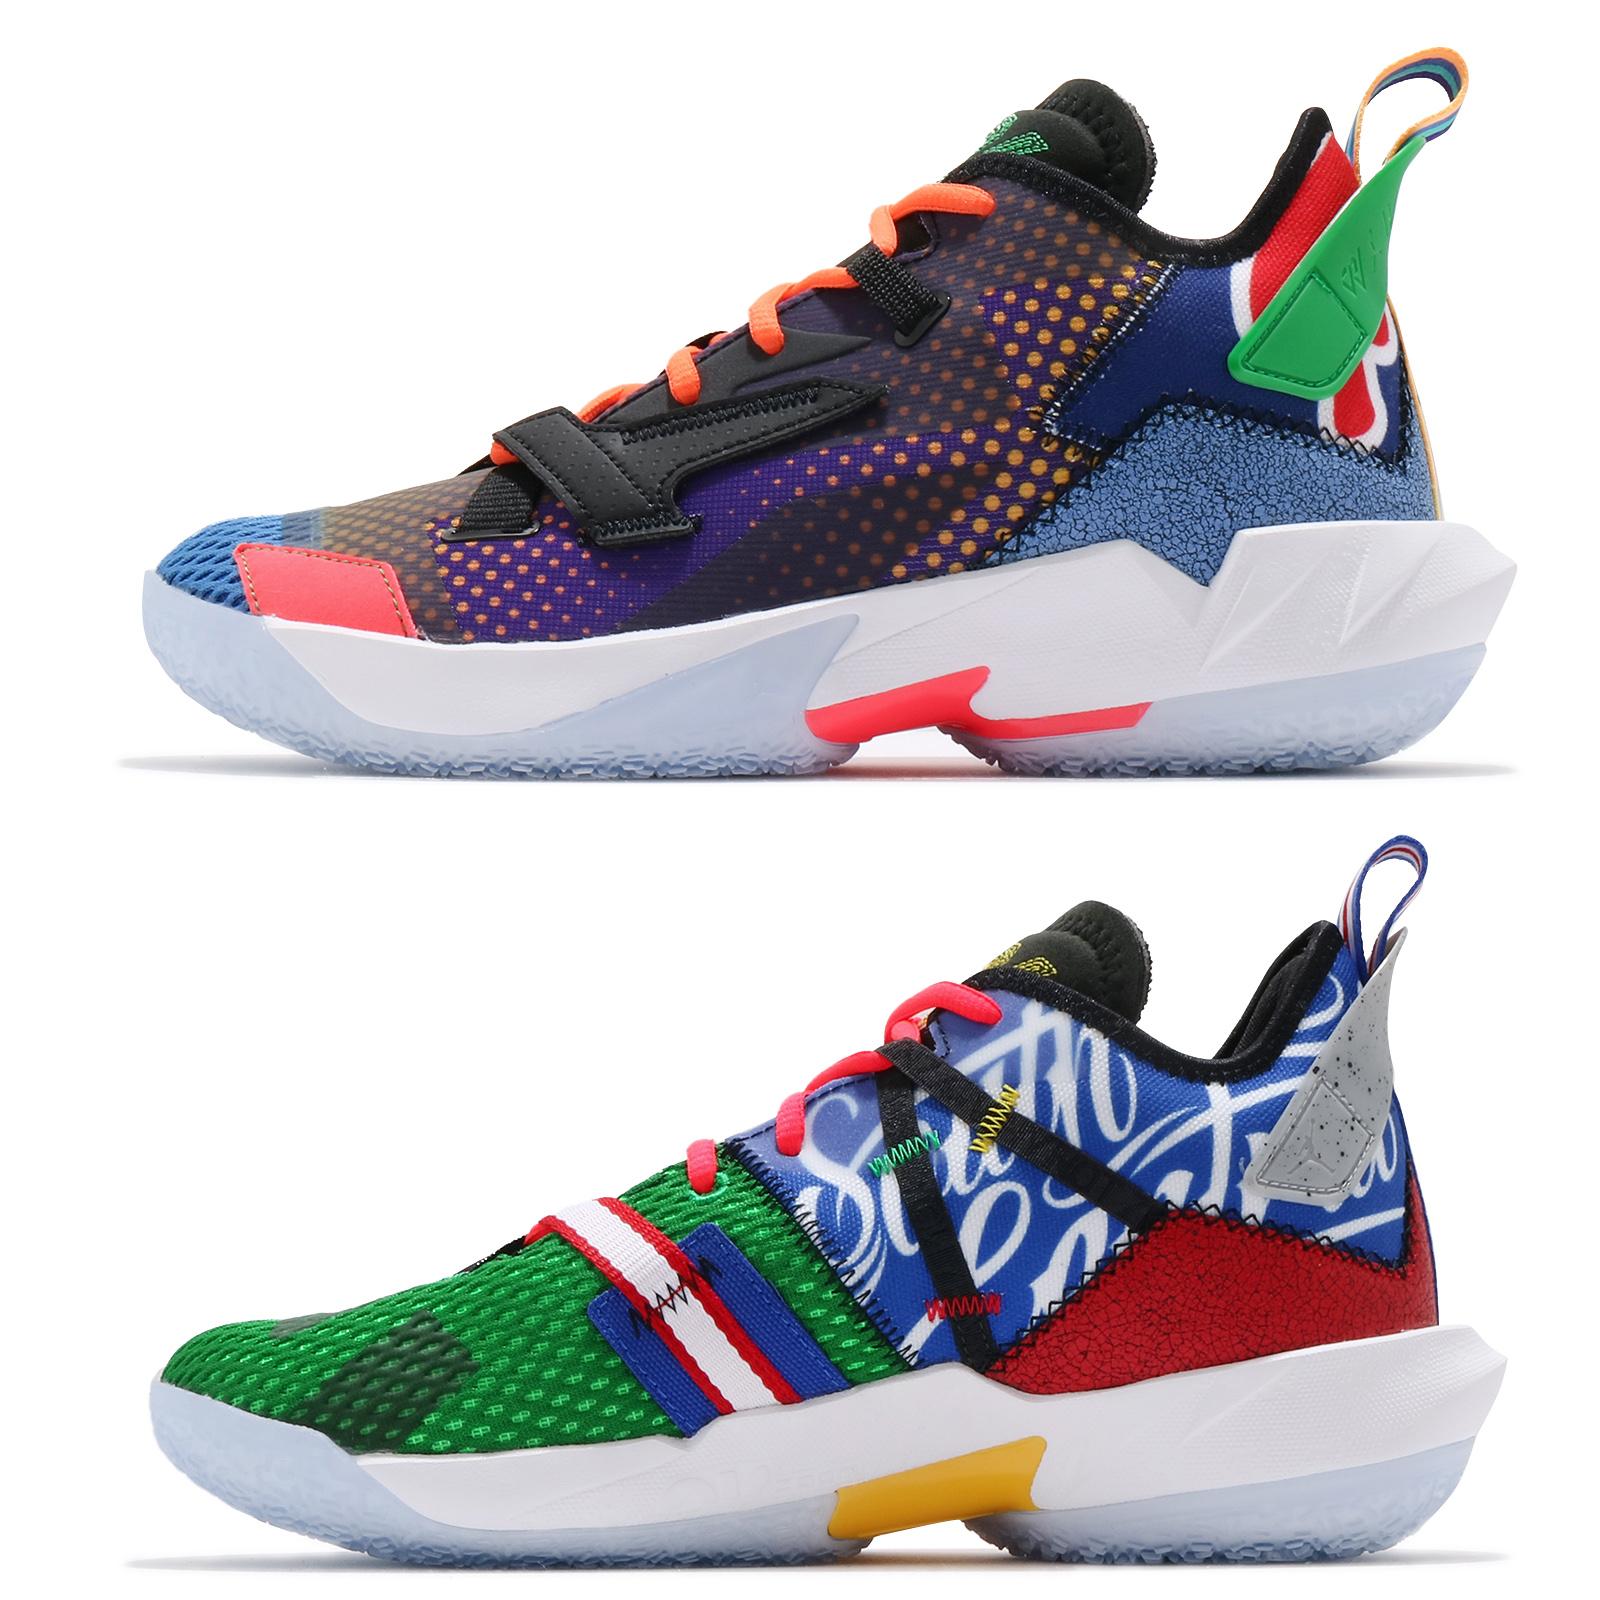 Nike 籃球鞋 Jordan Why Not Zer0.4 彩色 男鞋 忍者龜 四代 【ACS】 DD1134-103